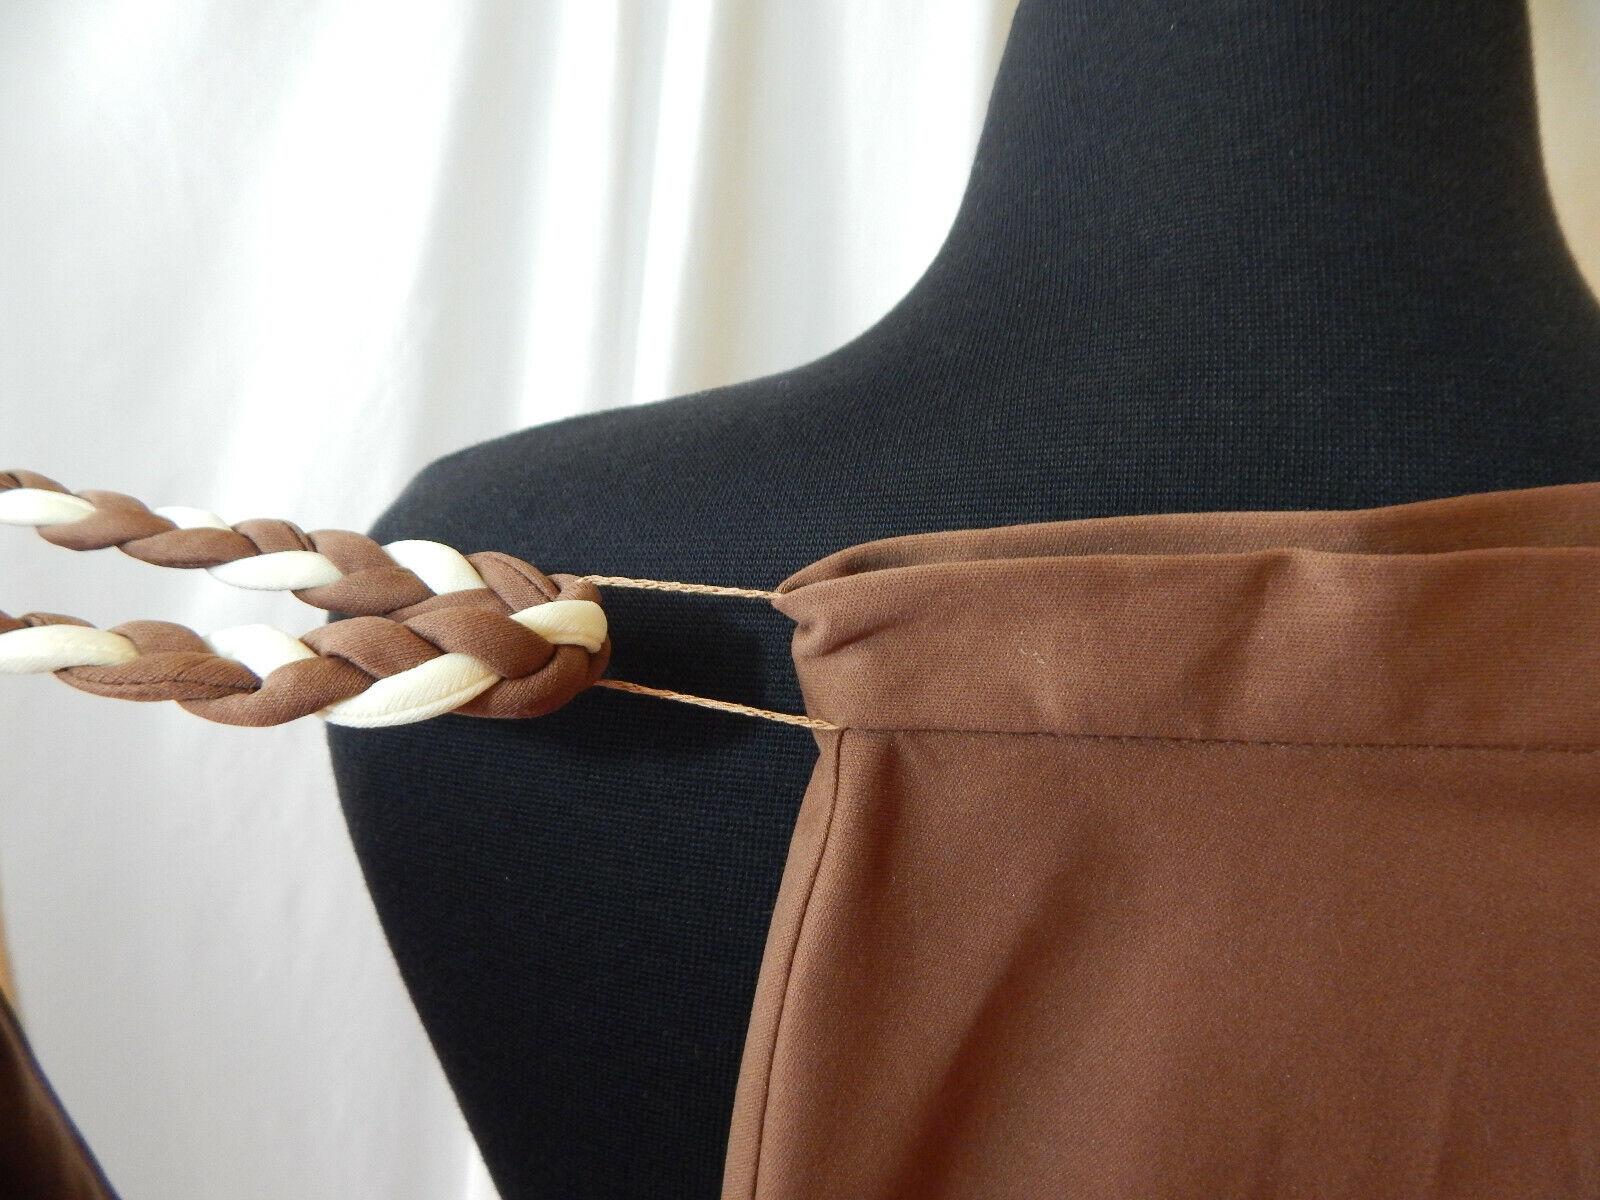 Vintage Miss Shaheen Skirt - image 6